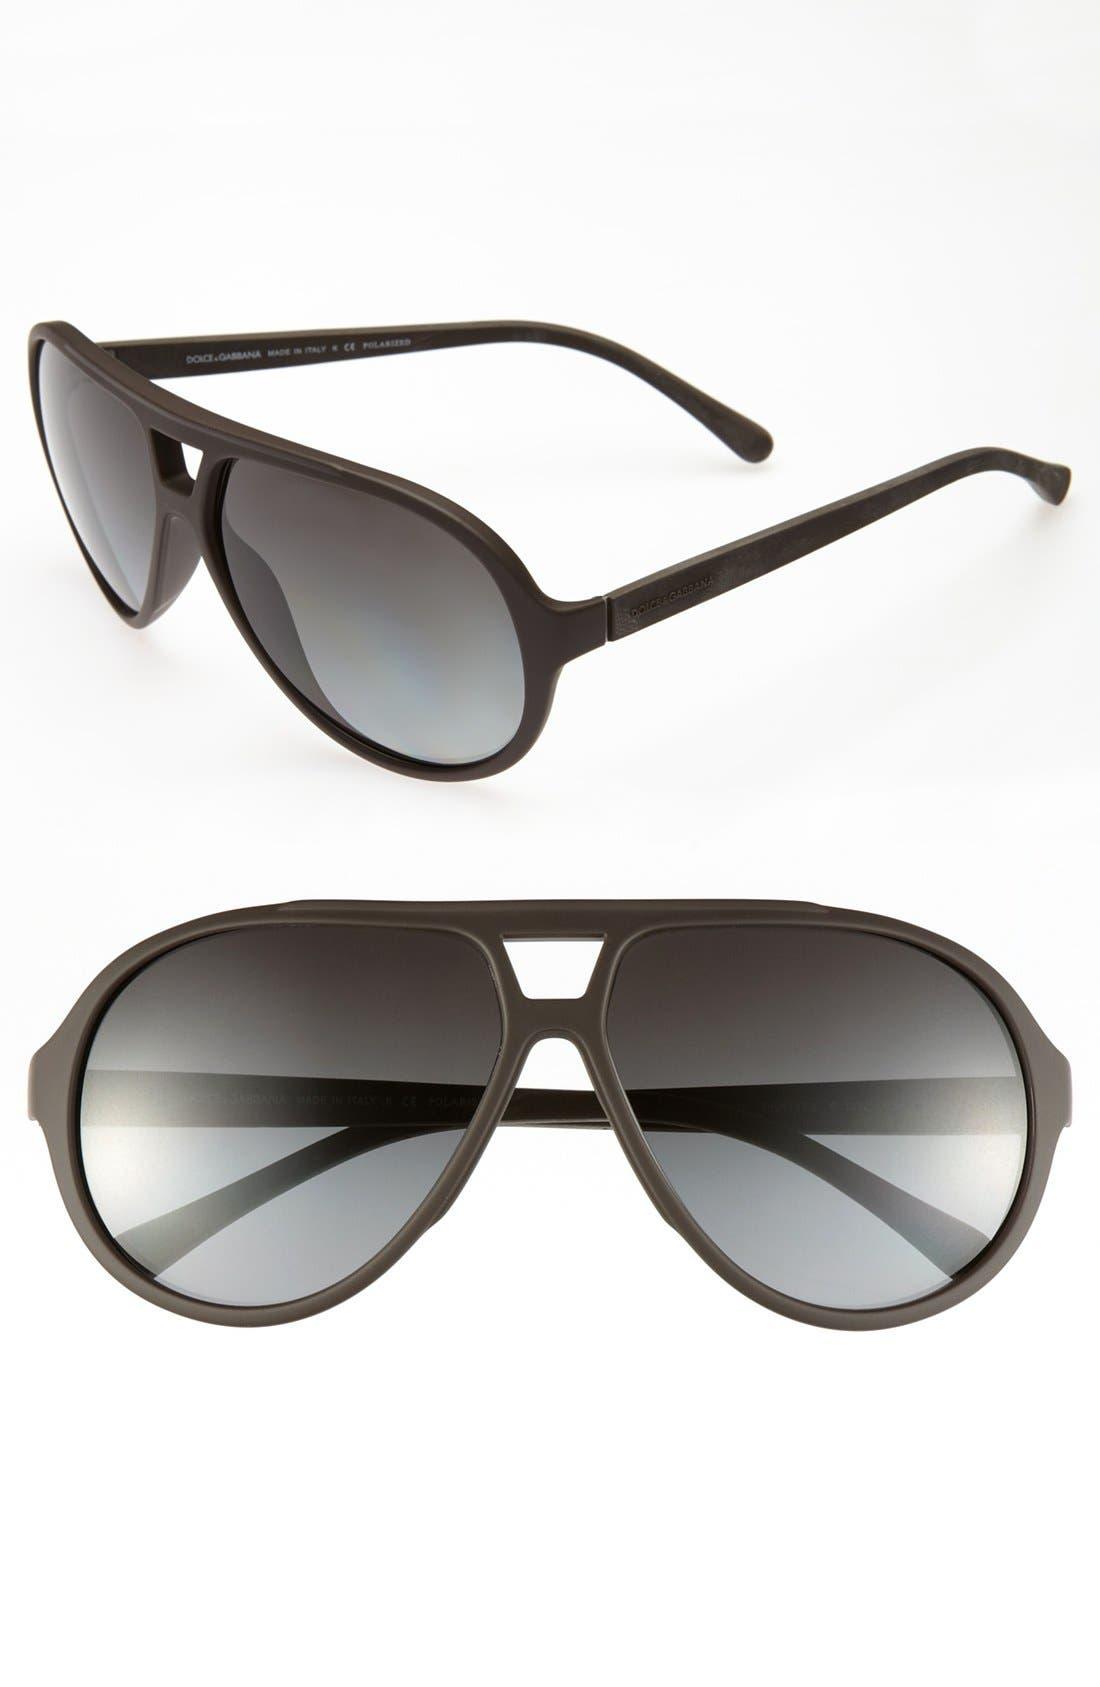 Alternate Image 1 Selected - Dolce&Gabbana 61mm Polarized Aviator Sunglasses